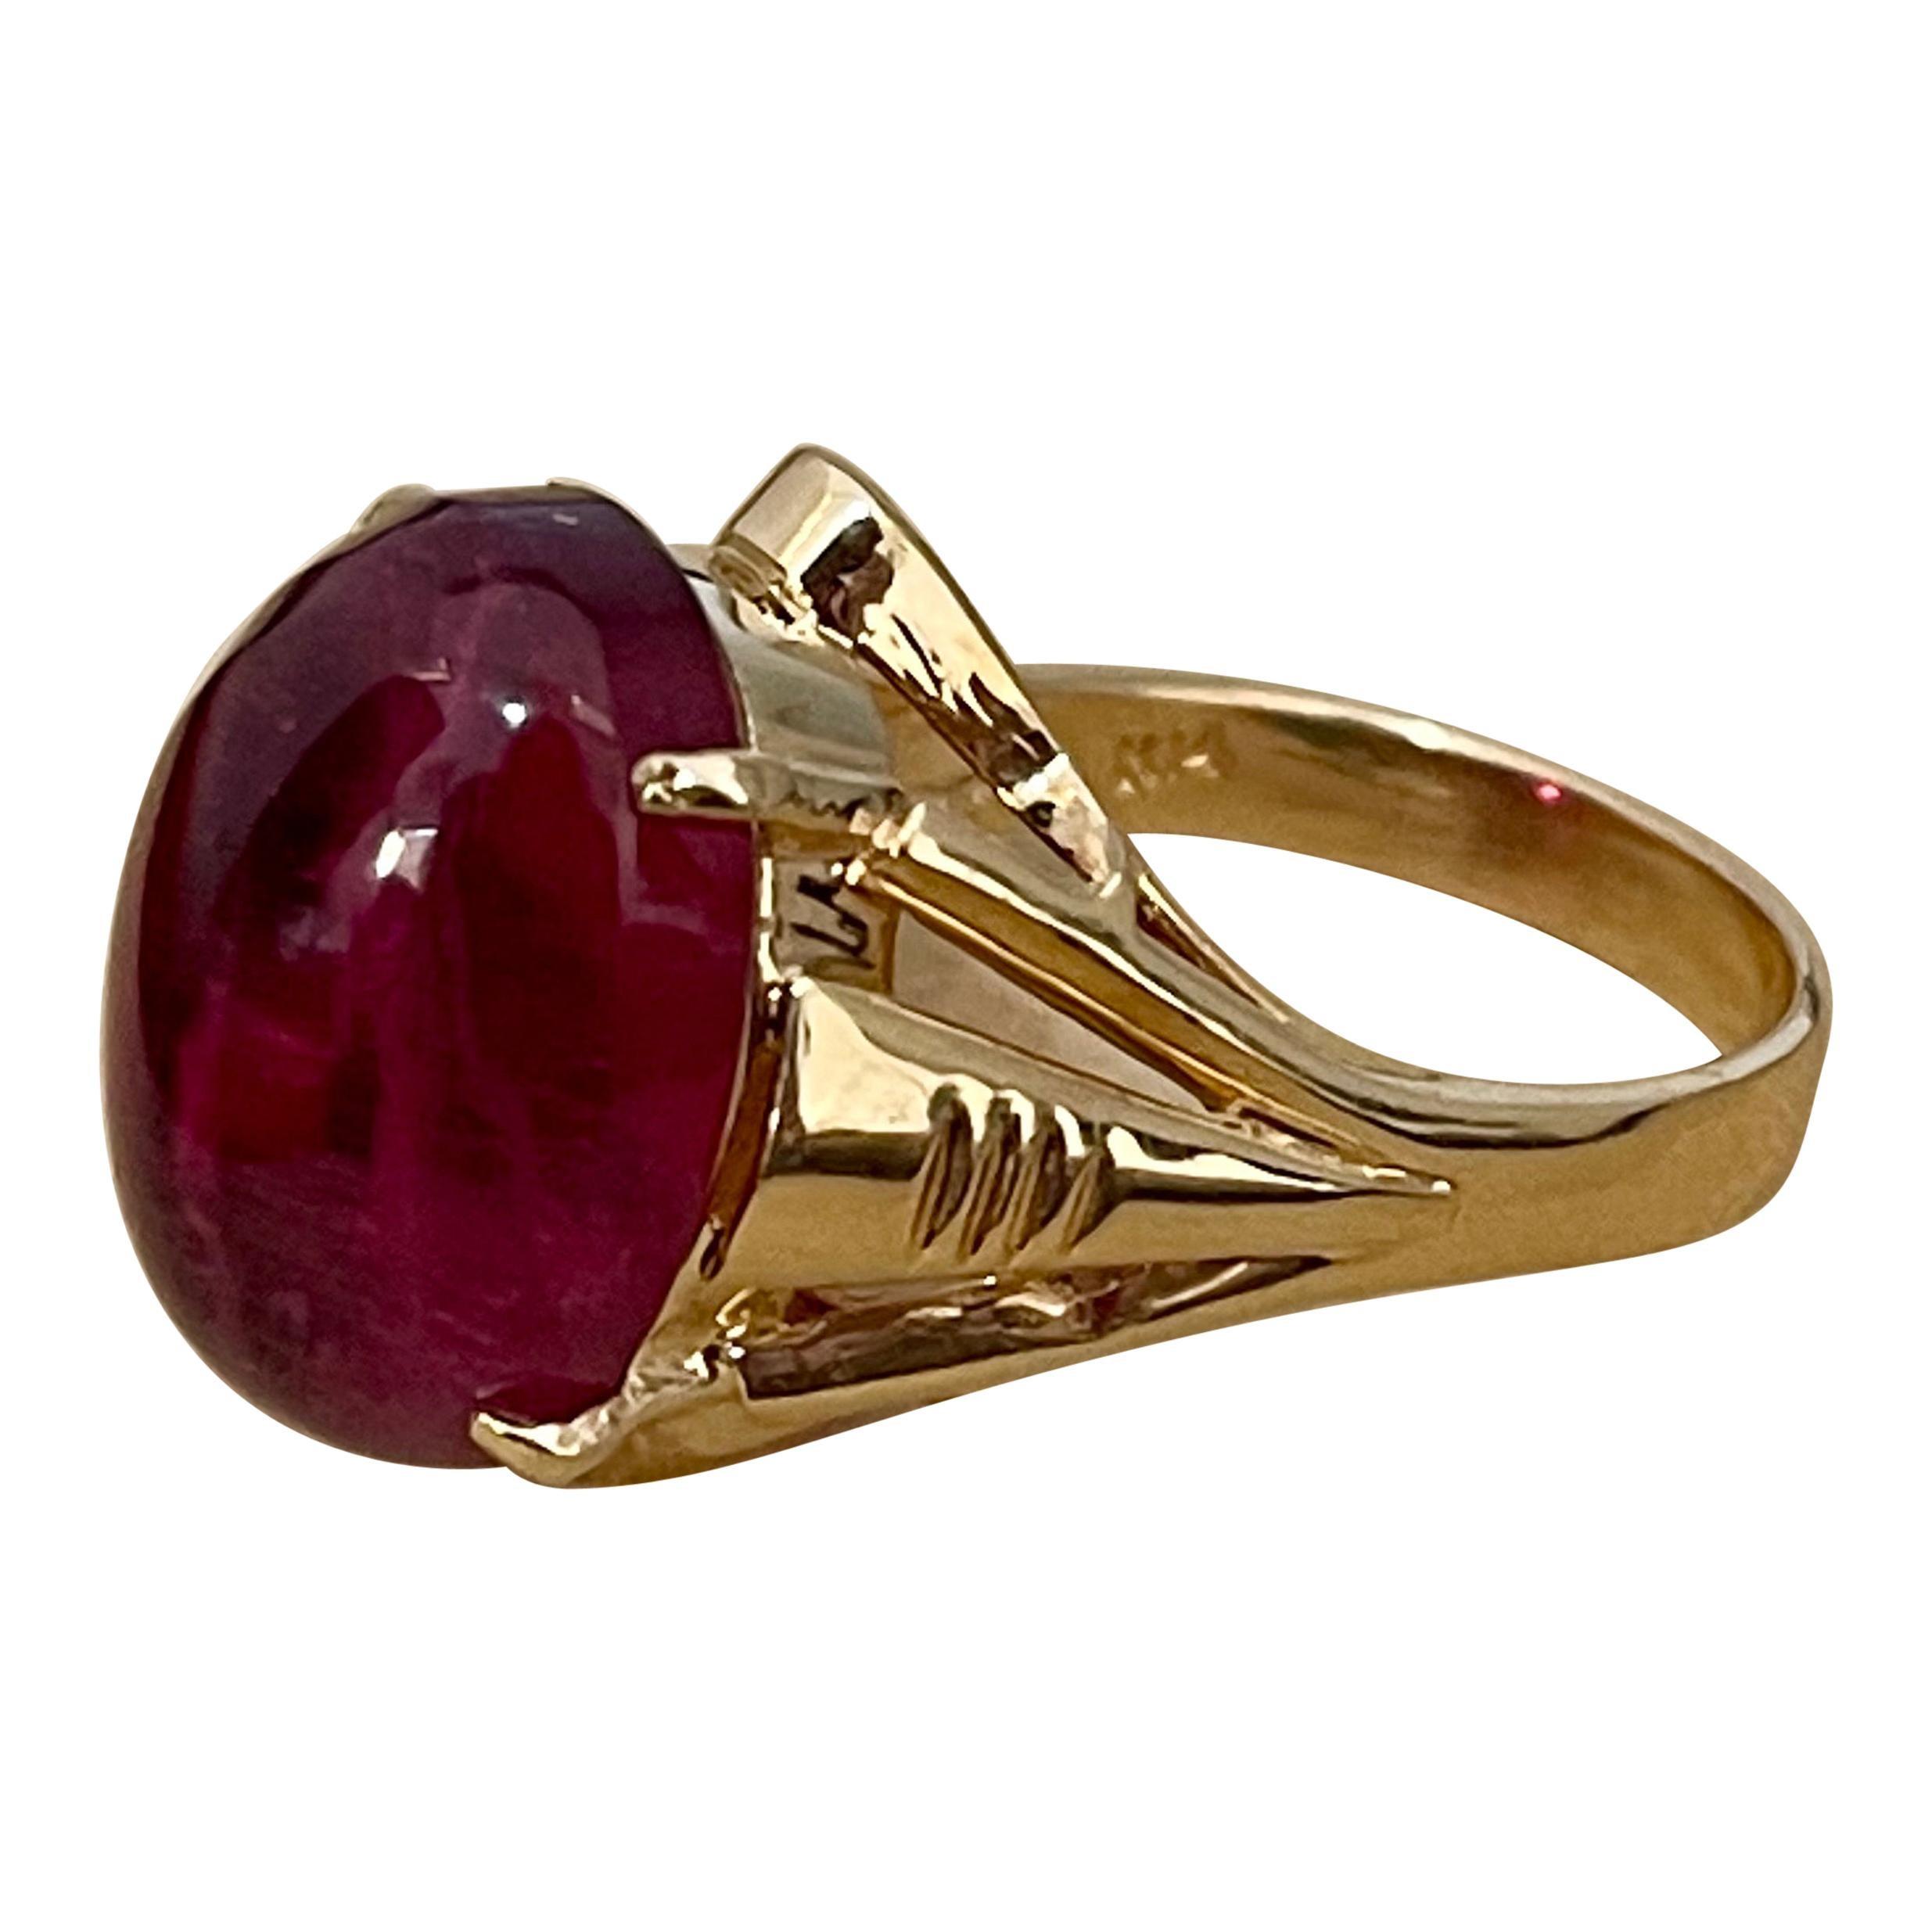 12.6 Carat Oval Cut Cabochon Pink Tourmaline 14 Karat Yellow Gold Ring